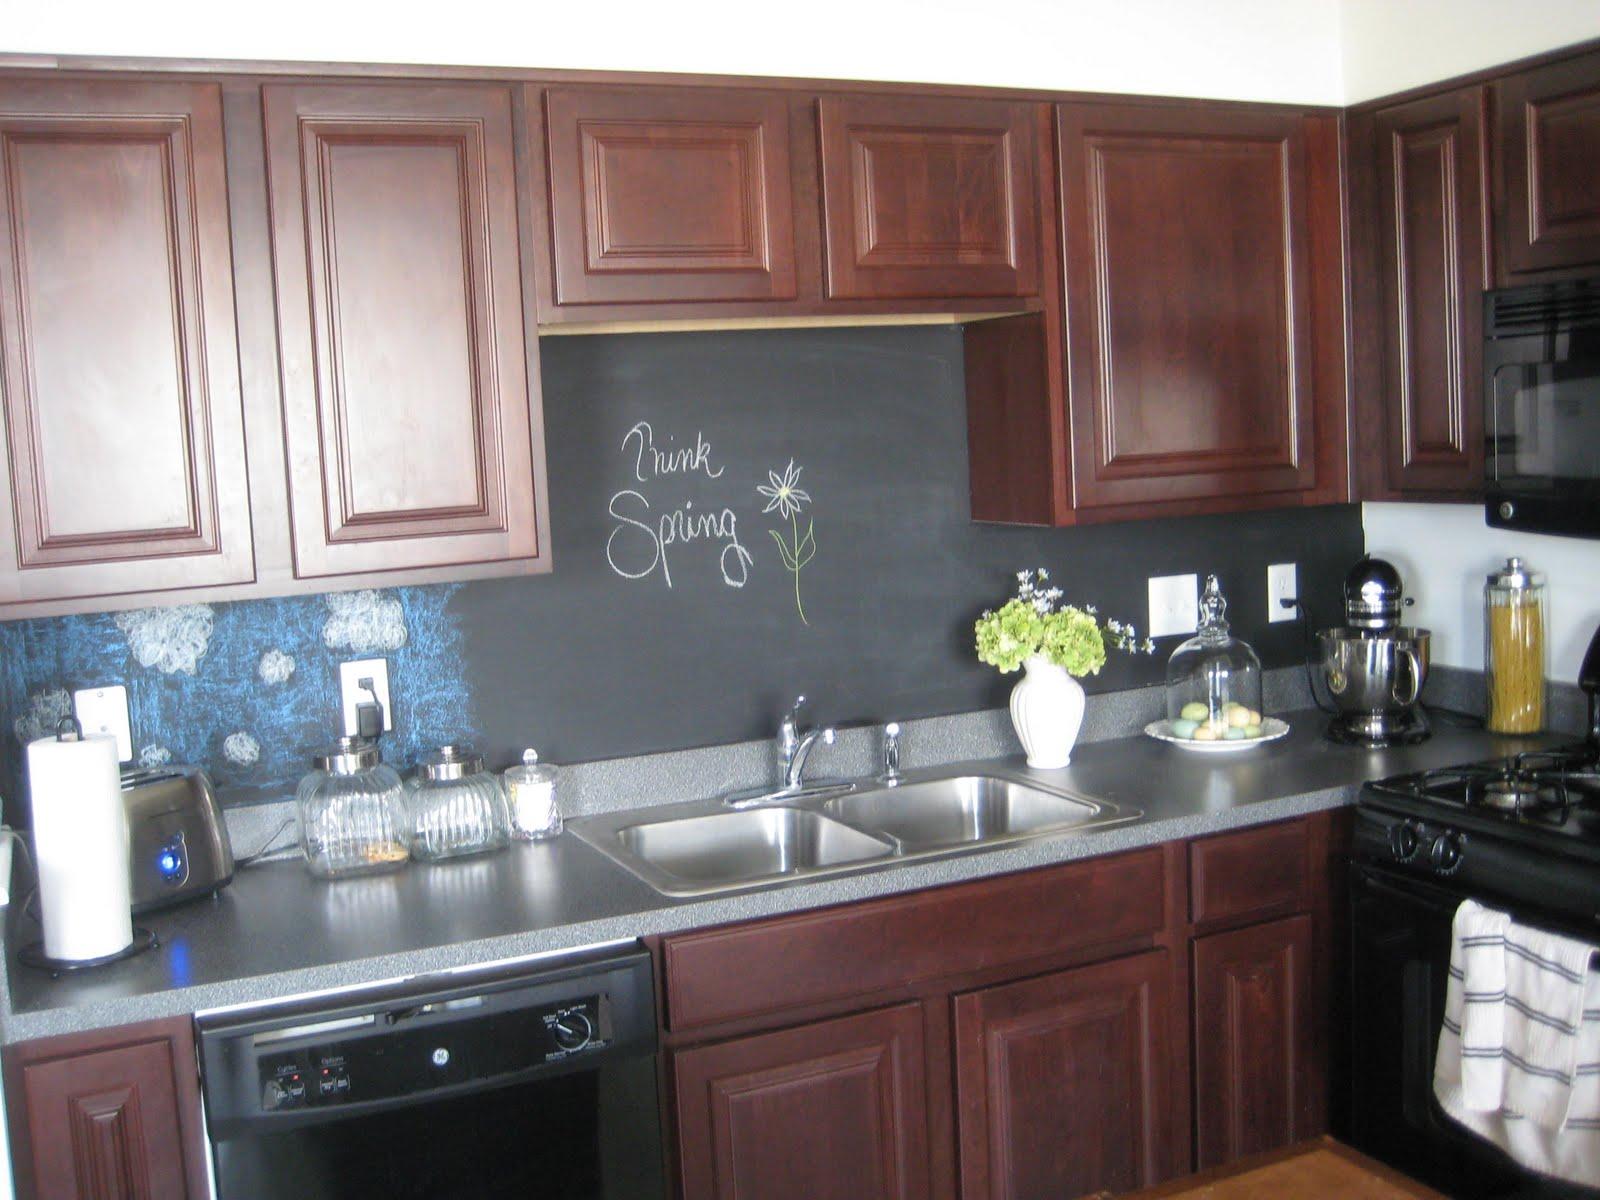 A Comfy Little Place Of My Own: Chalkboard Backsplash